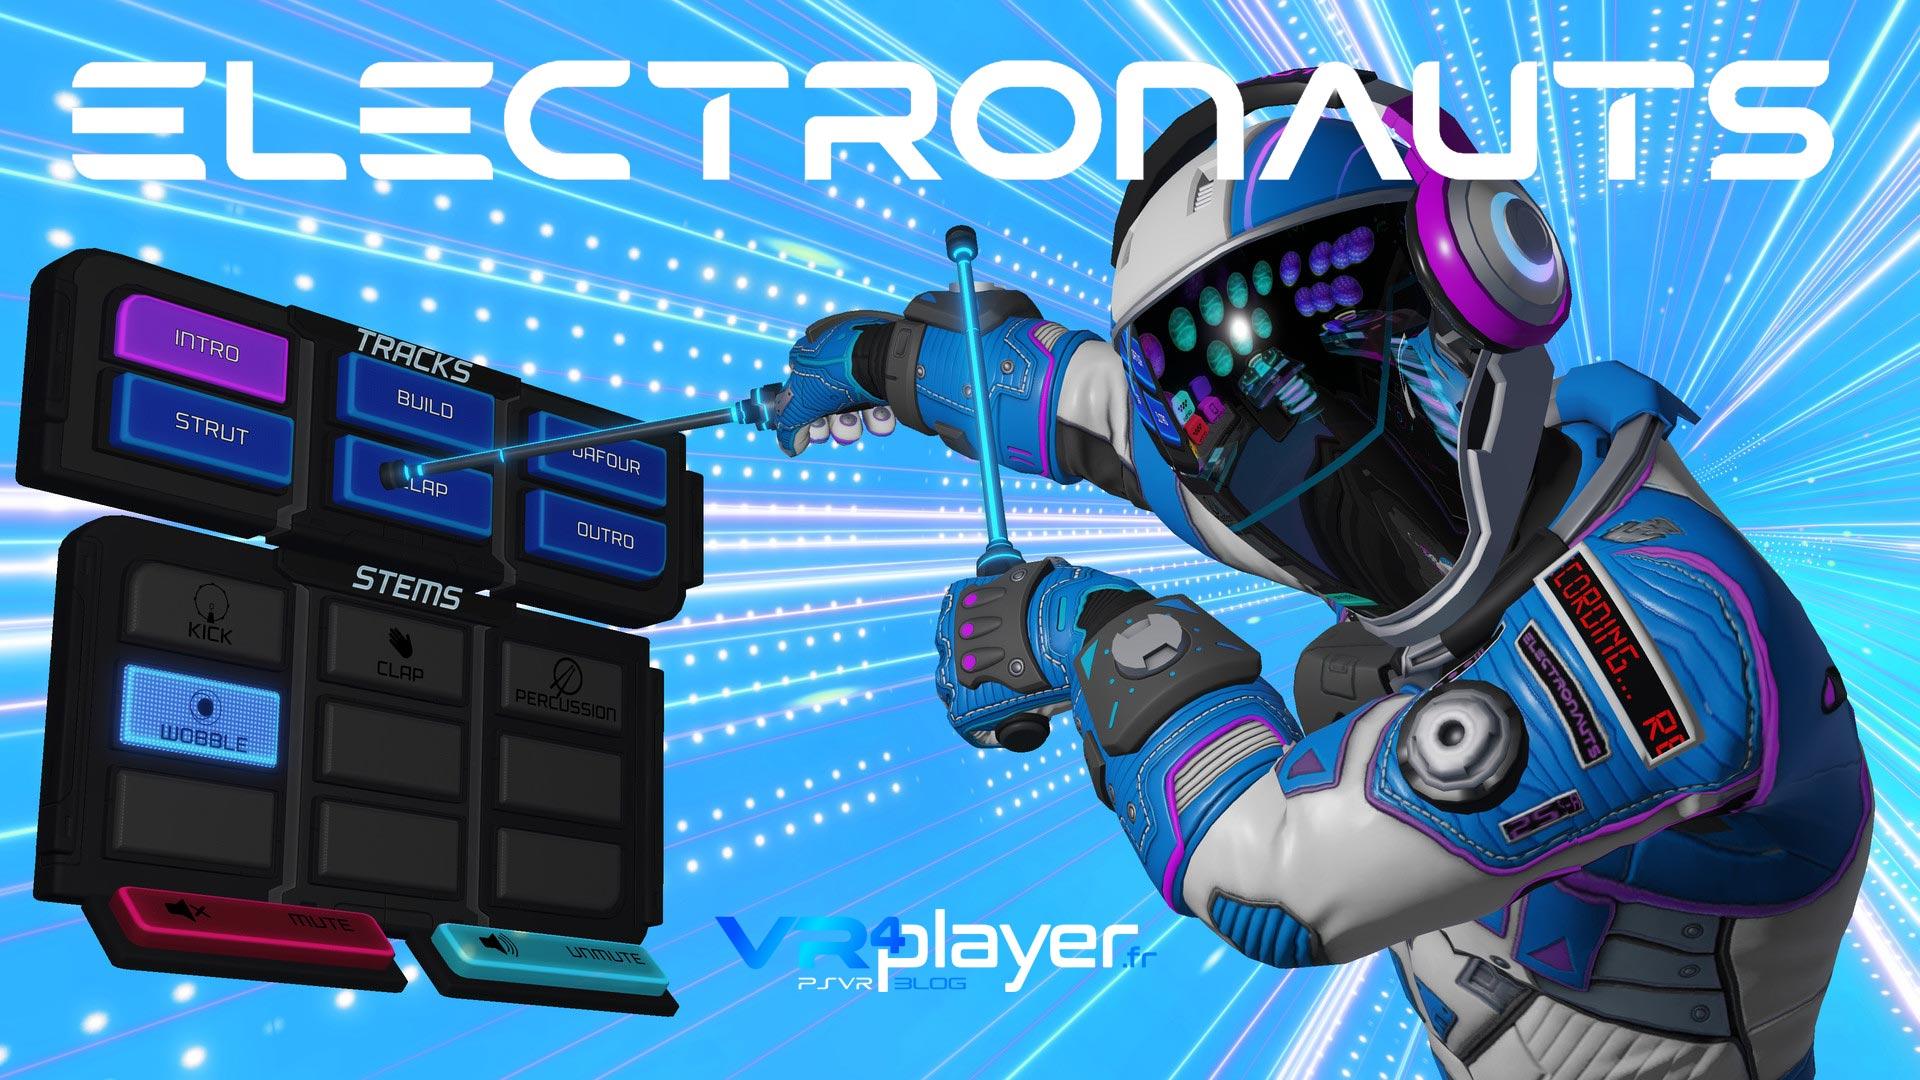 Electronauts PlayStation VR - vrplayer.fr